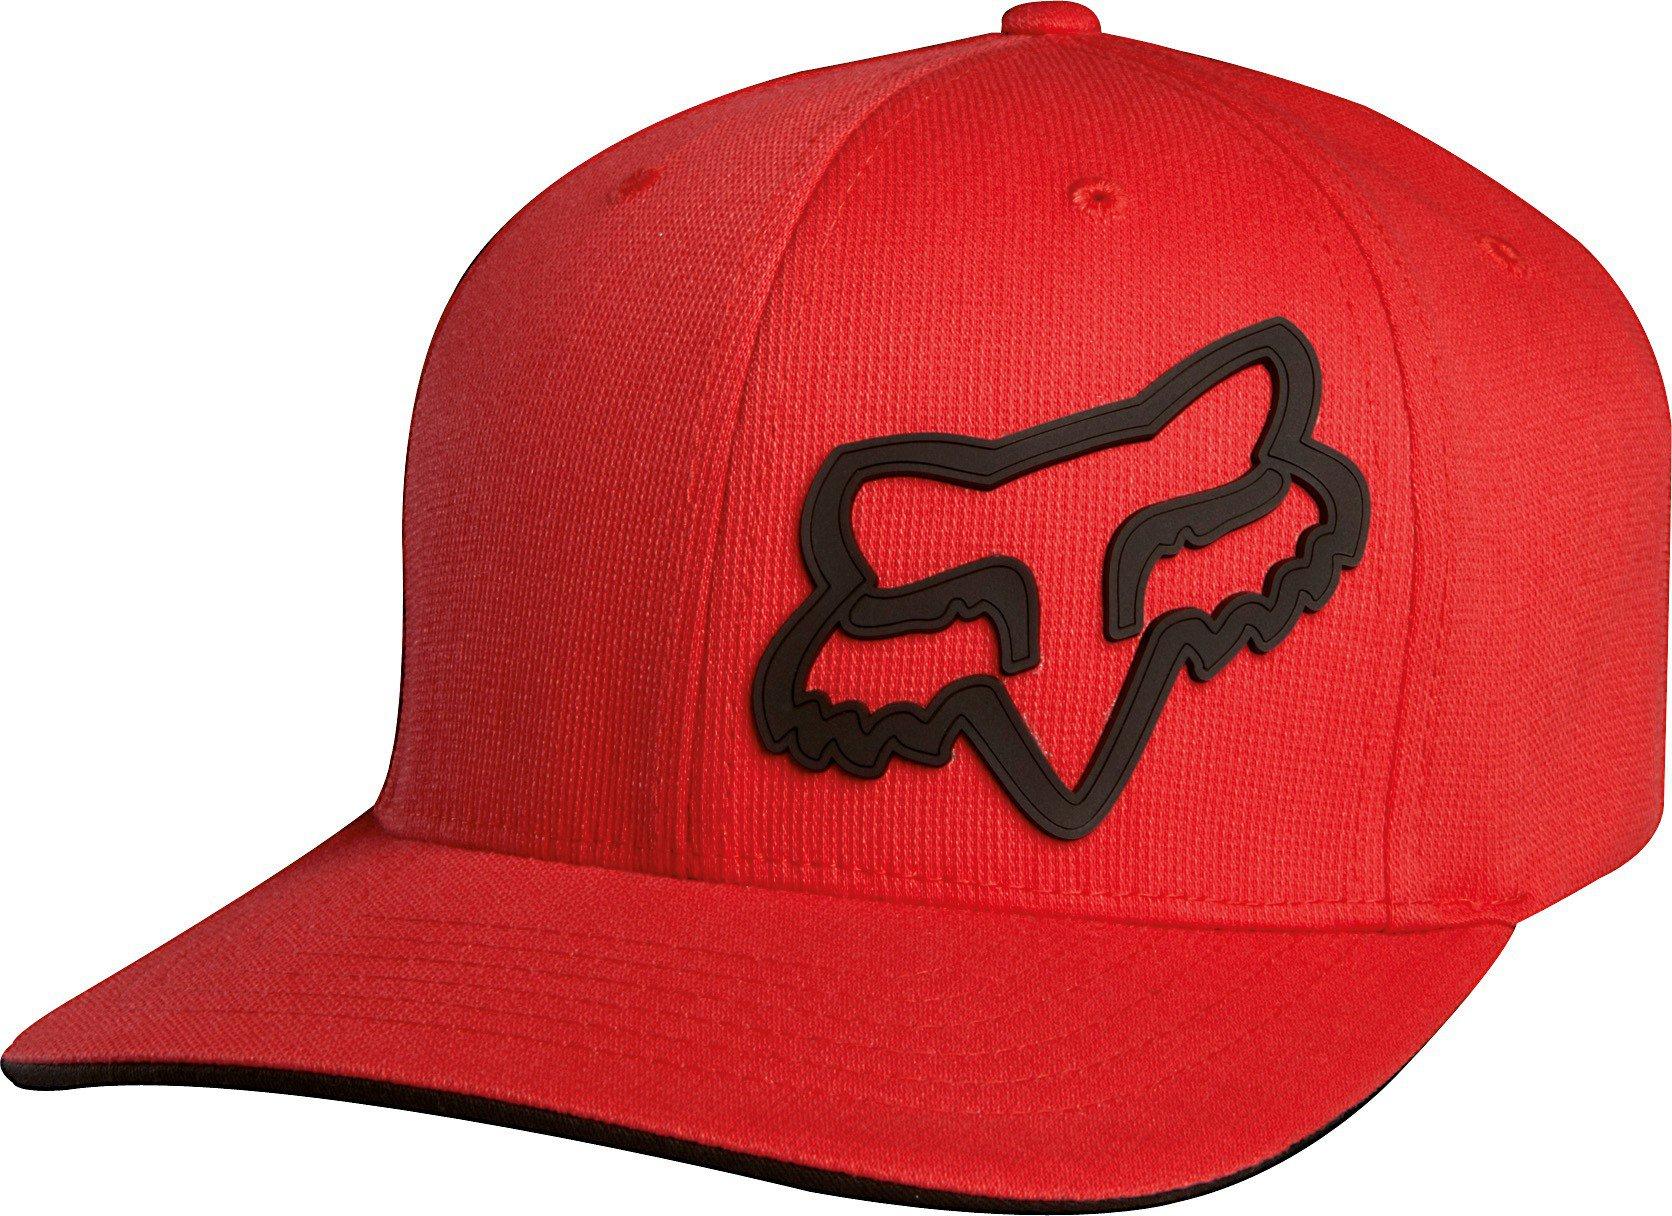 Čepice/Kšiltovka FOX Flexfit Signature červená